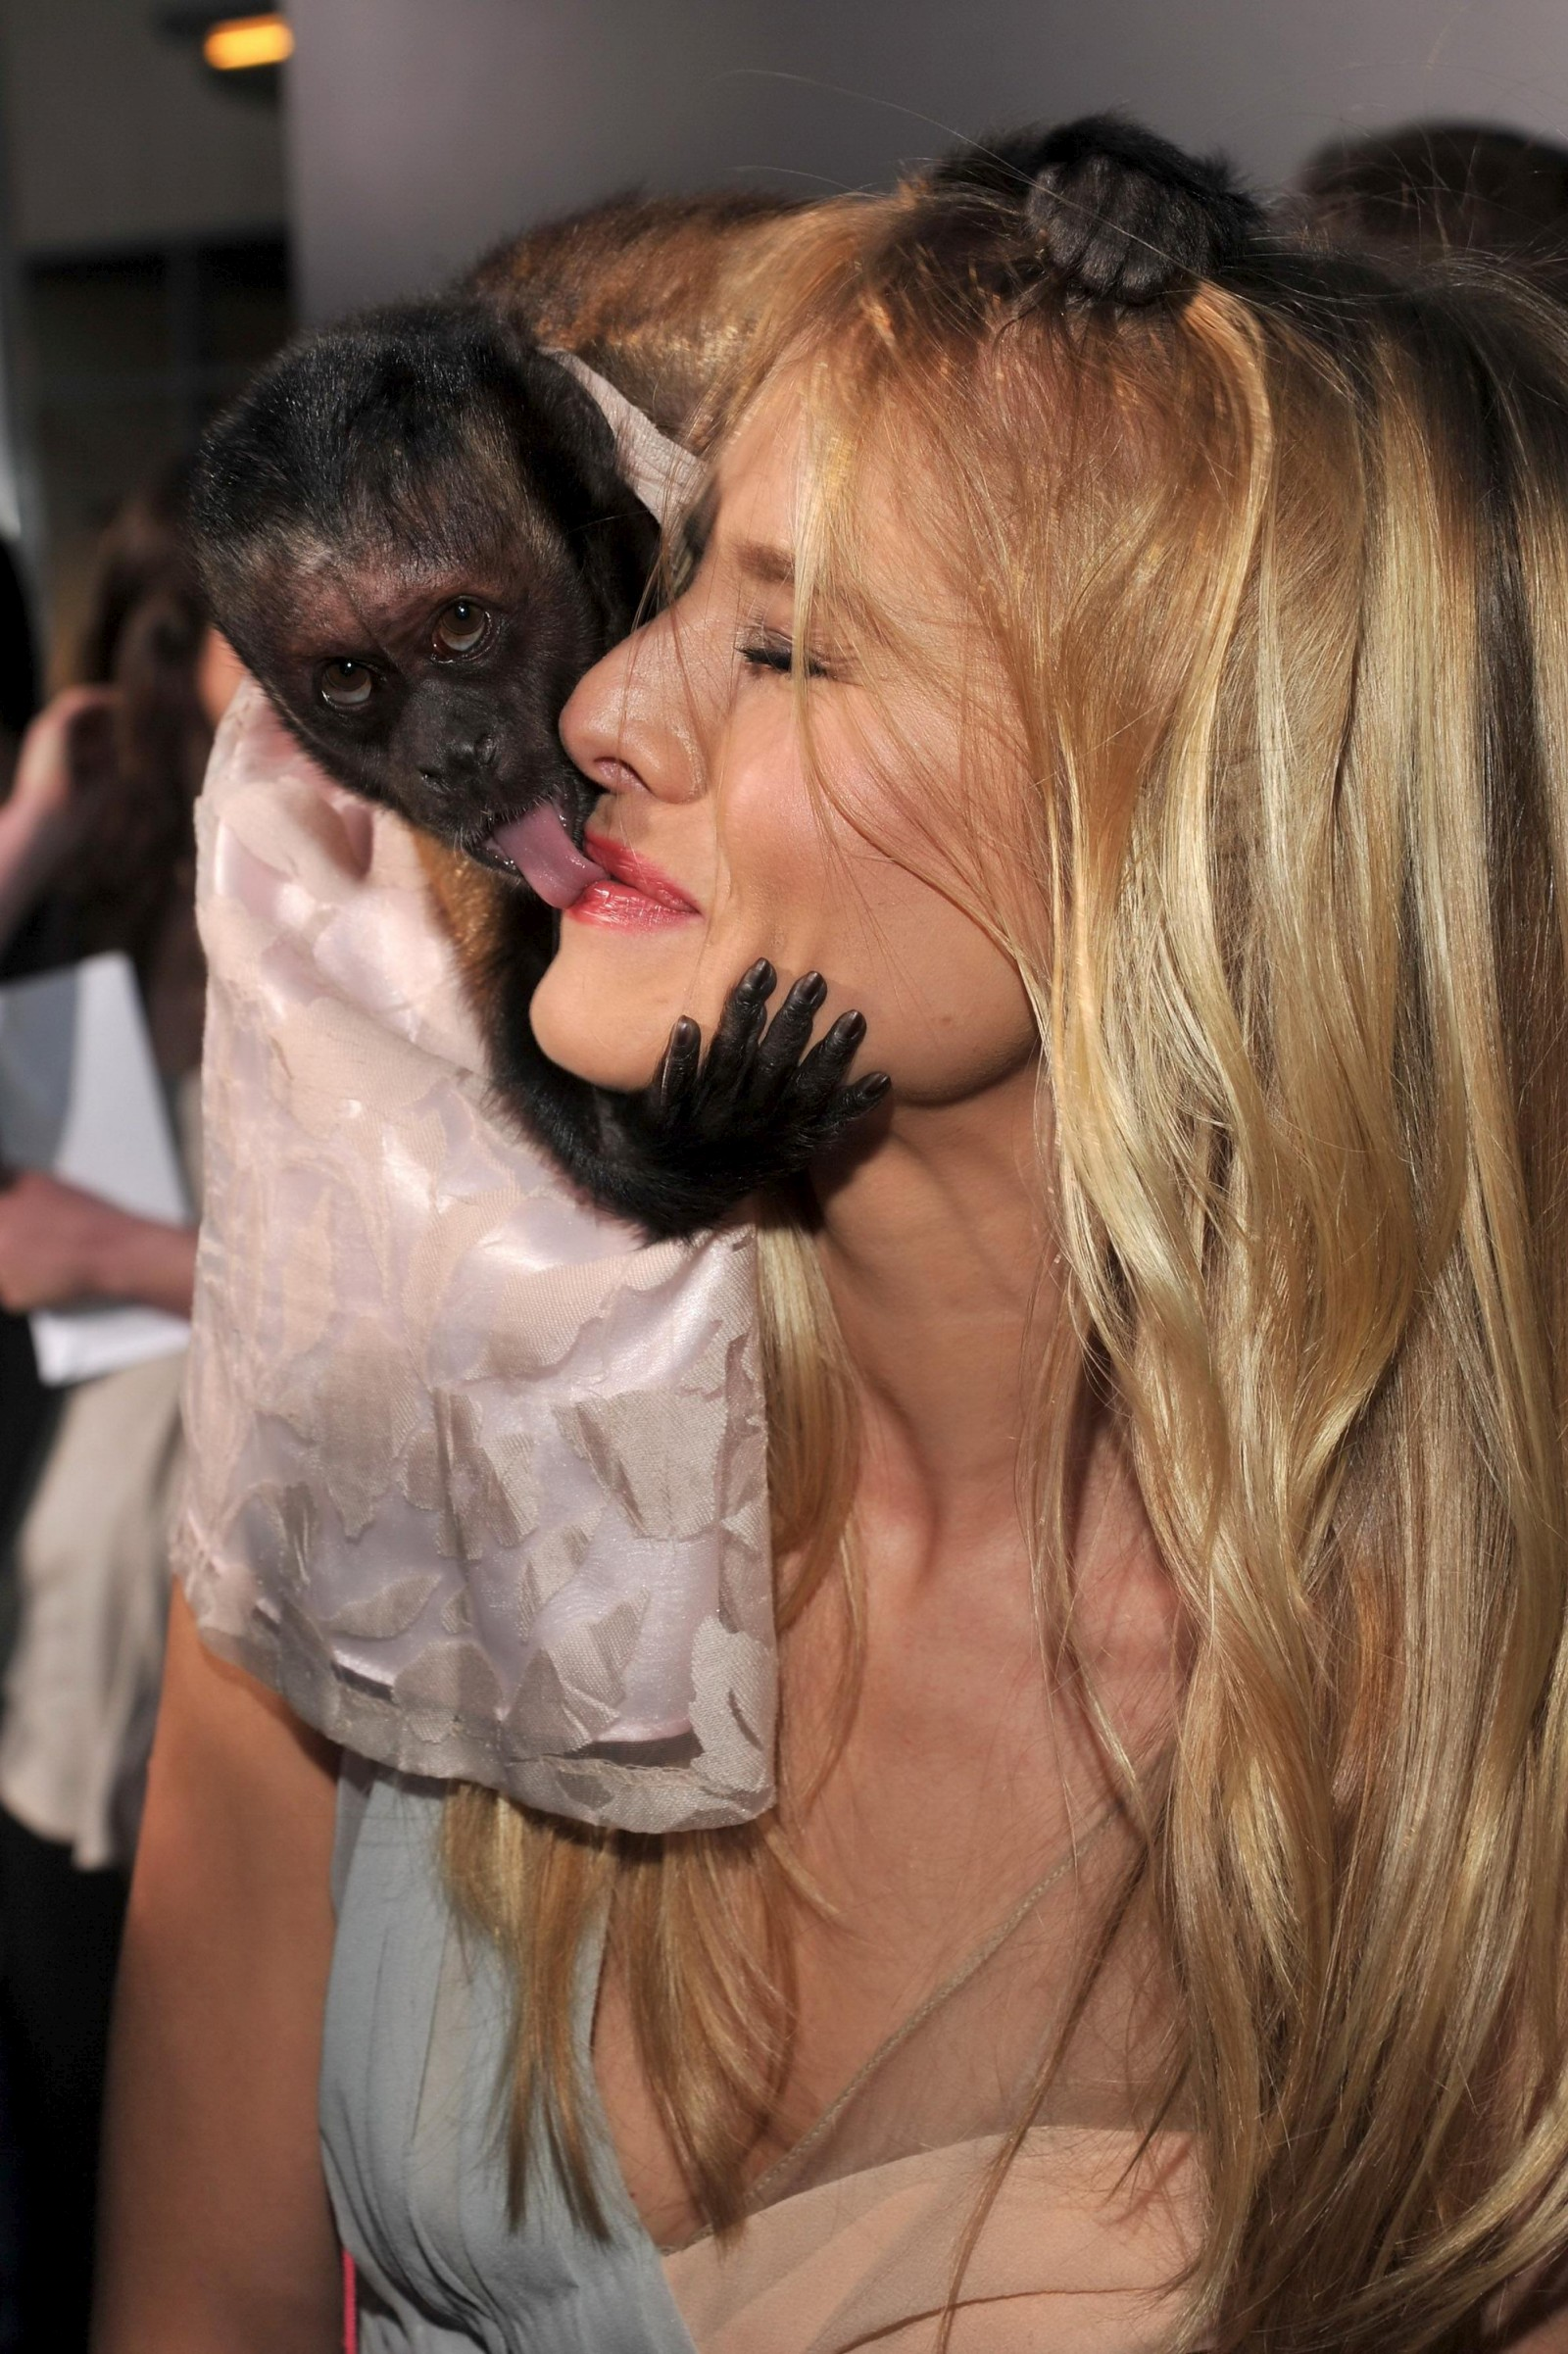 Girls fulk a monkey necked adult galleries